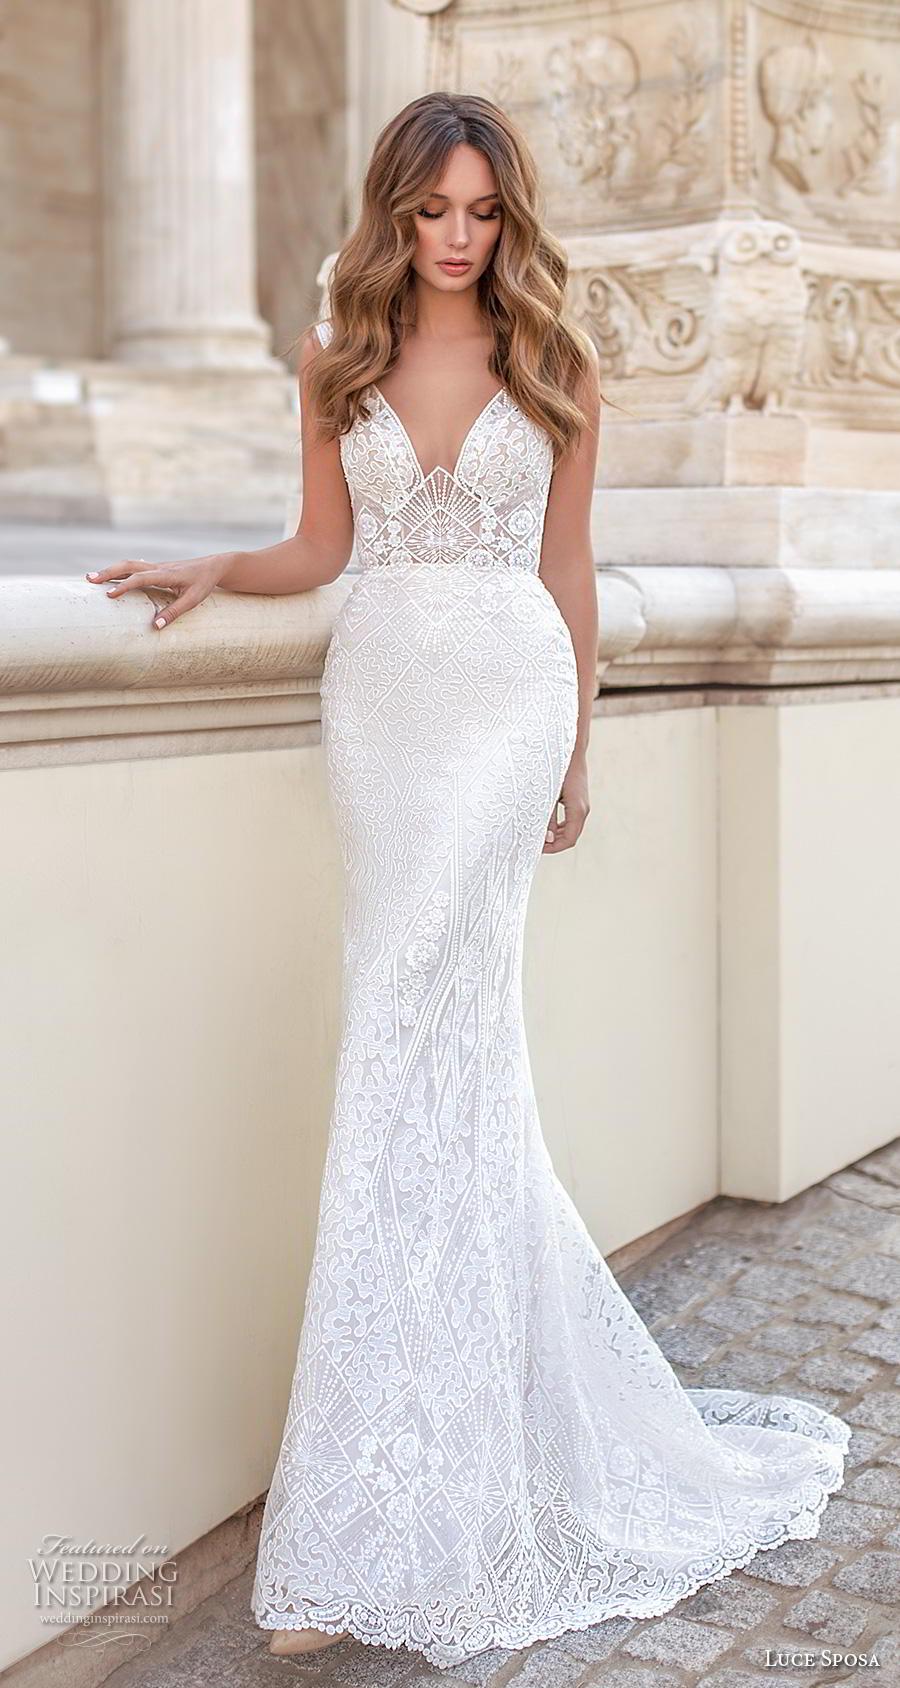 luce sposa 2020 bridal sleeveless strap v neck full embellishment elegant fit and flare sheath wedding dress v back short train (10) mv